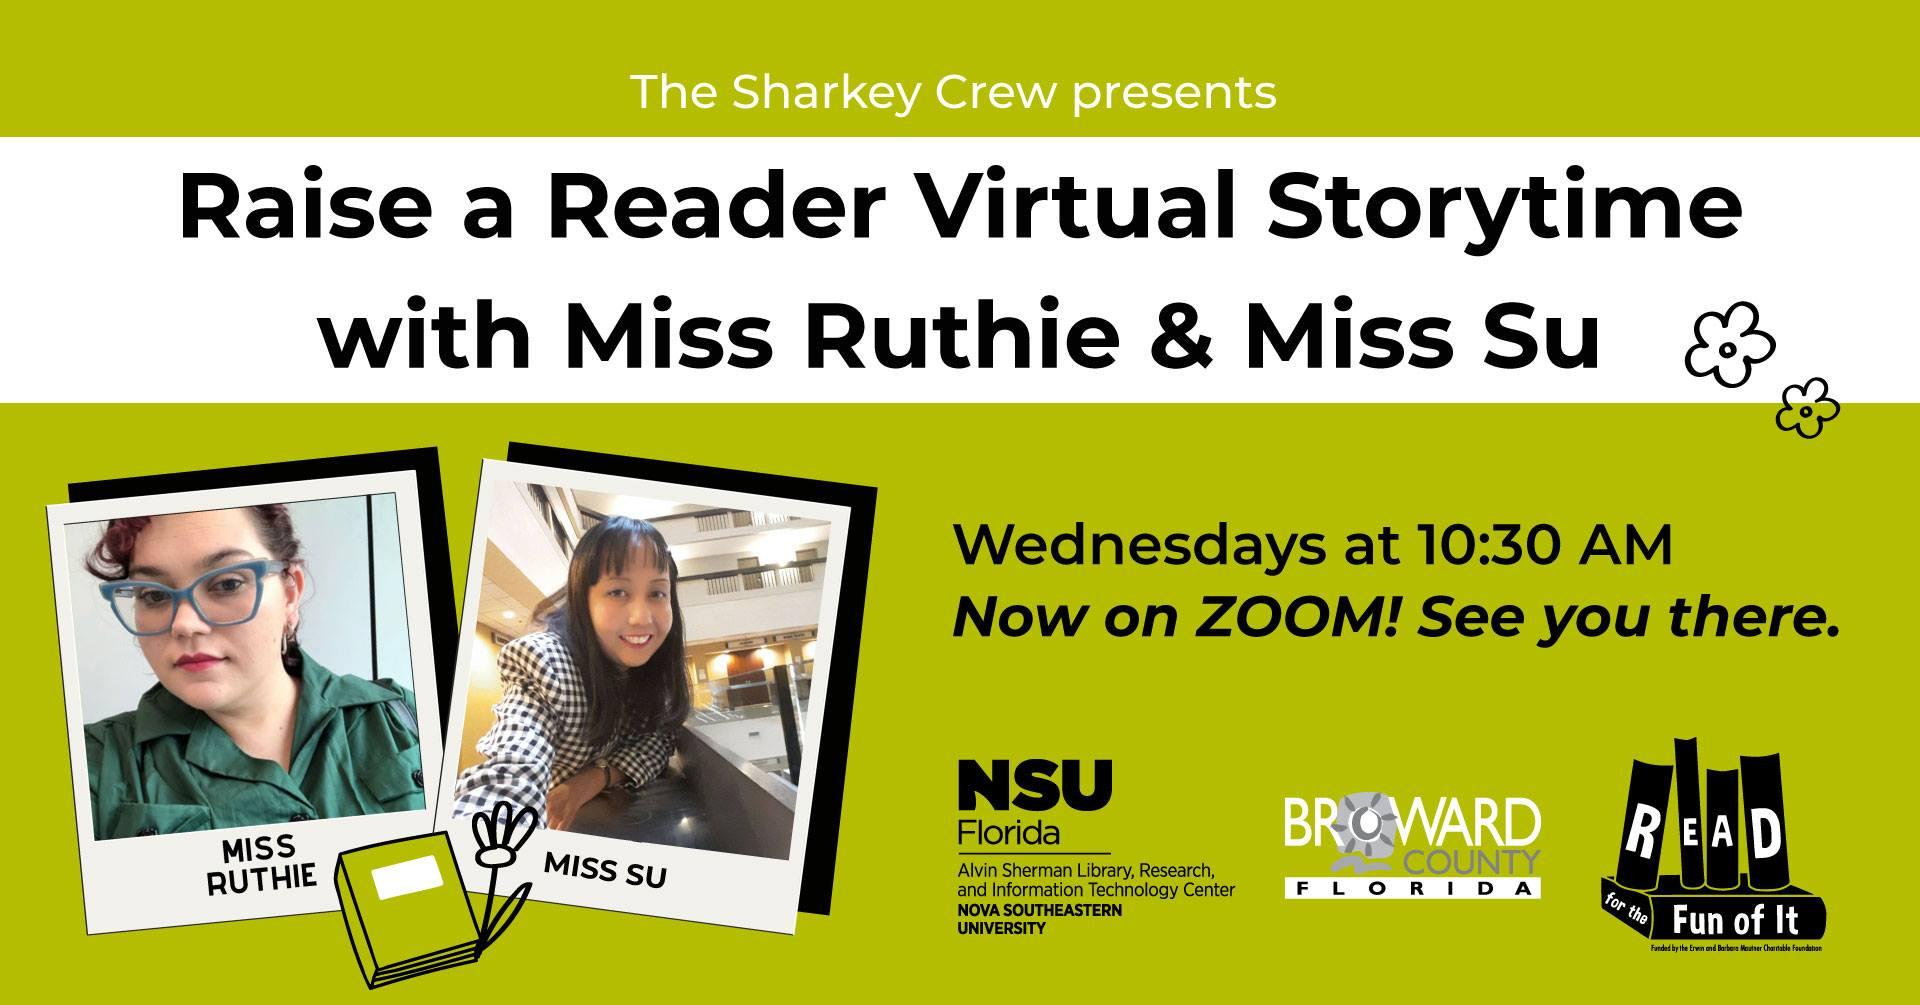 Raise a Reader Storytime